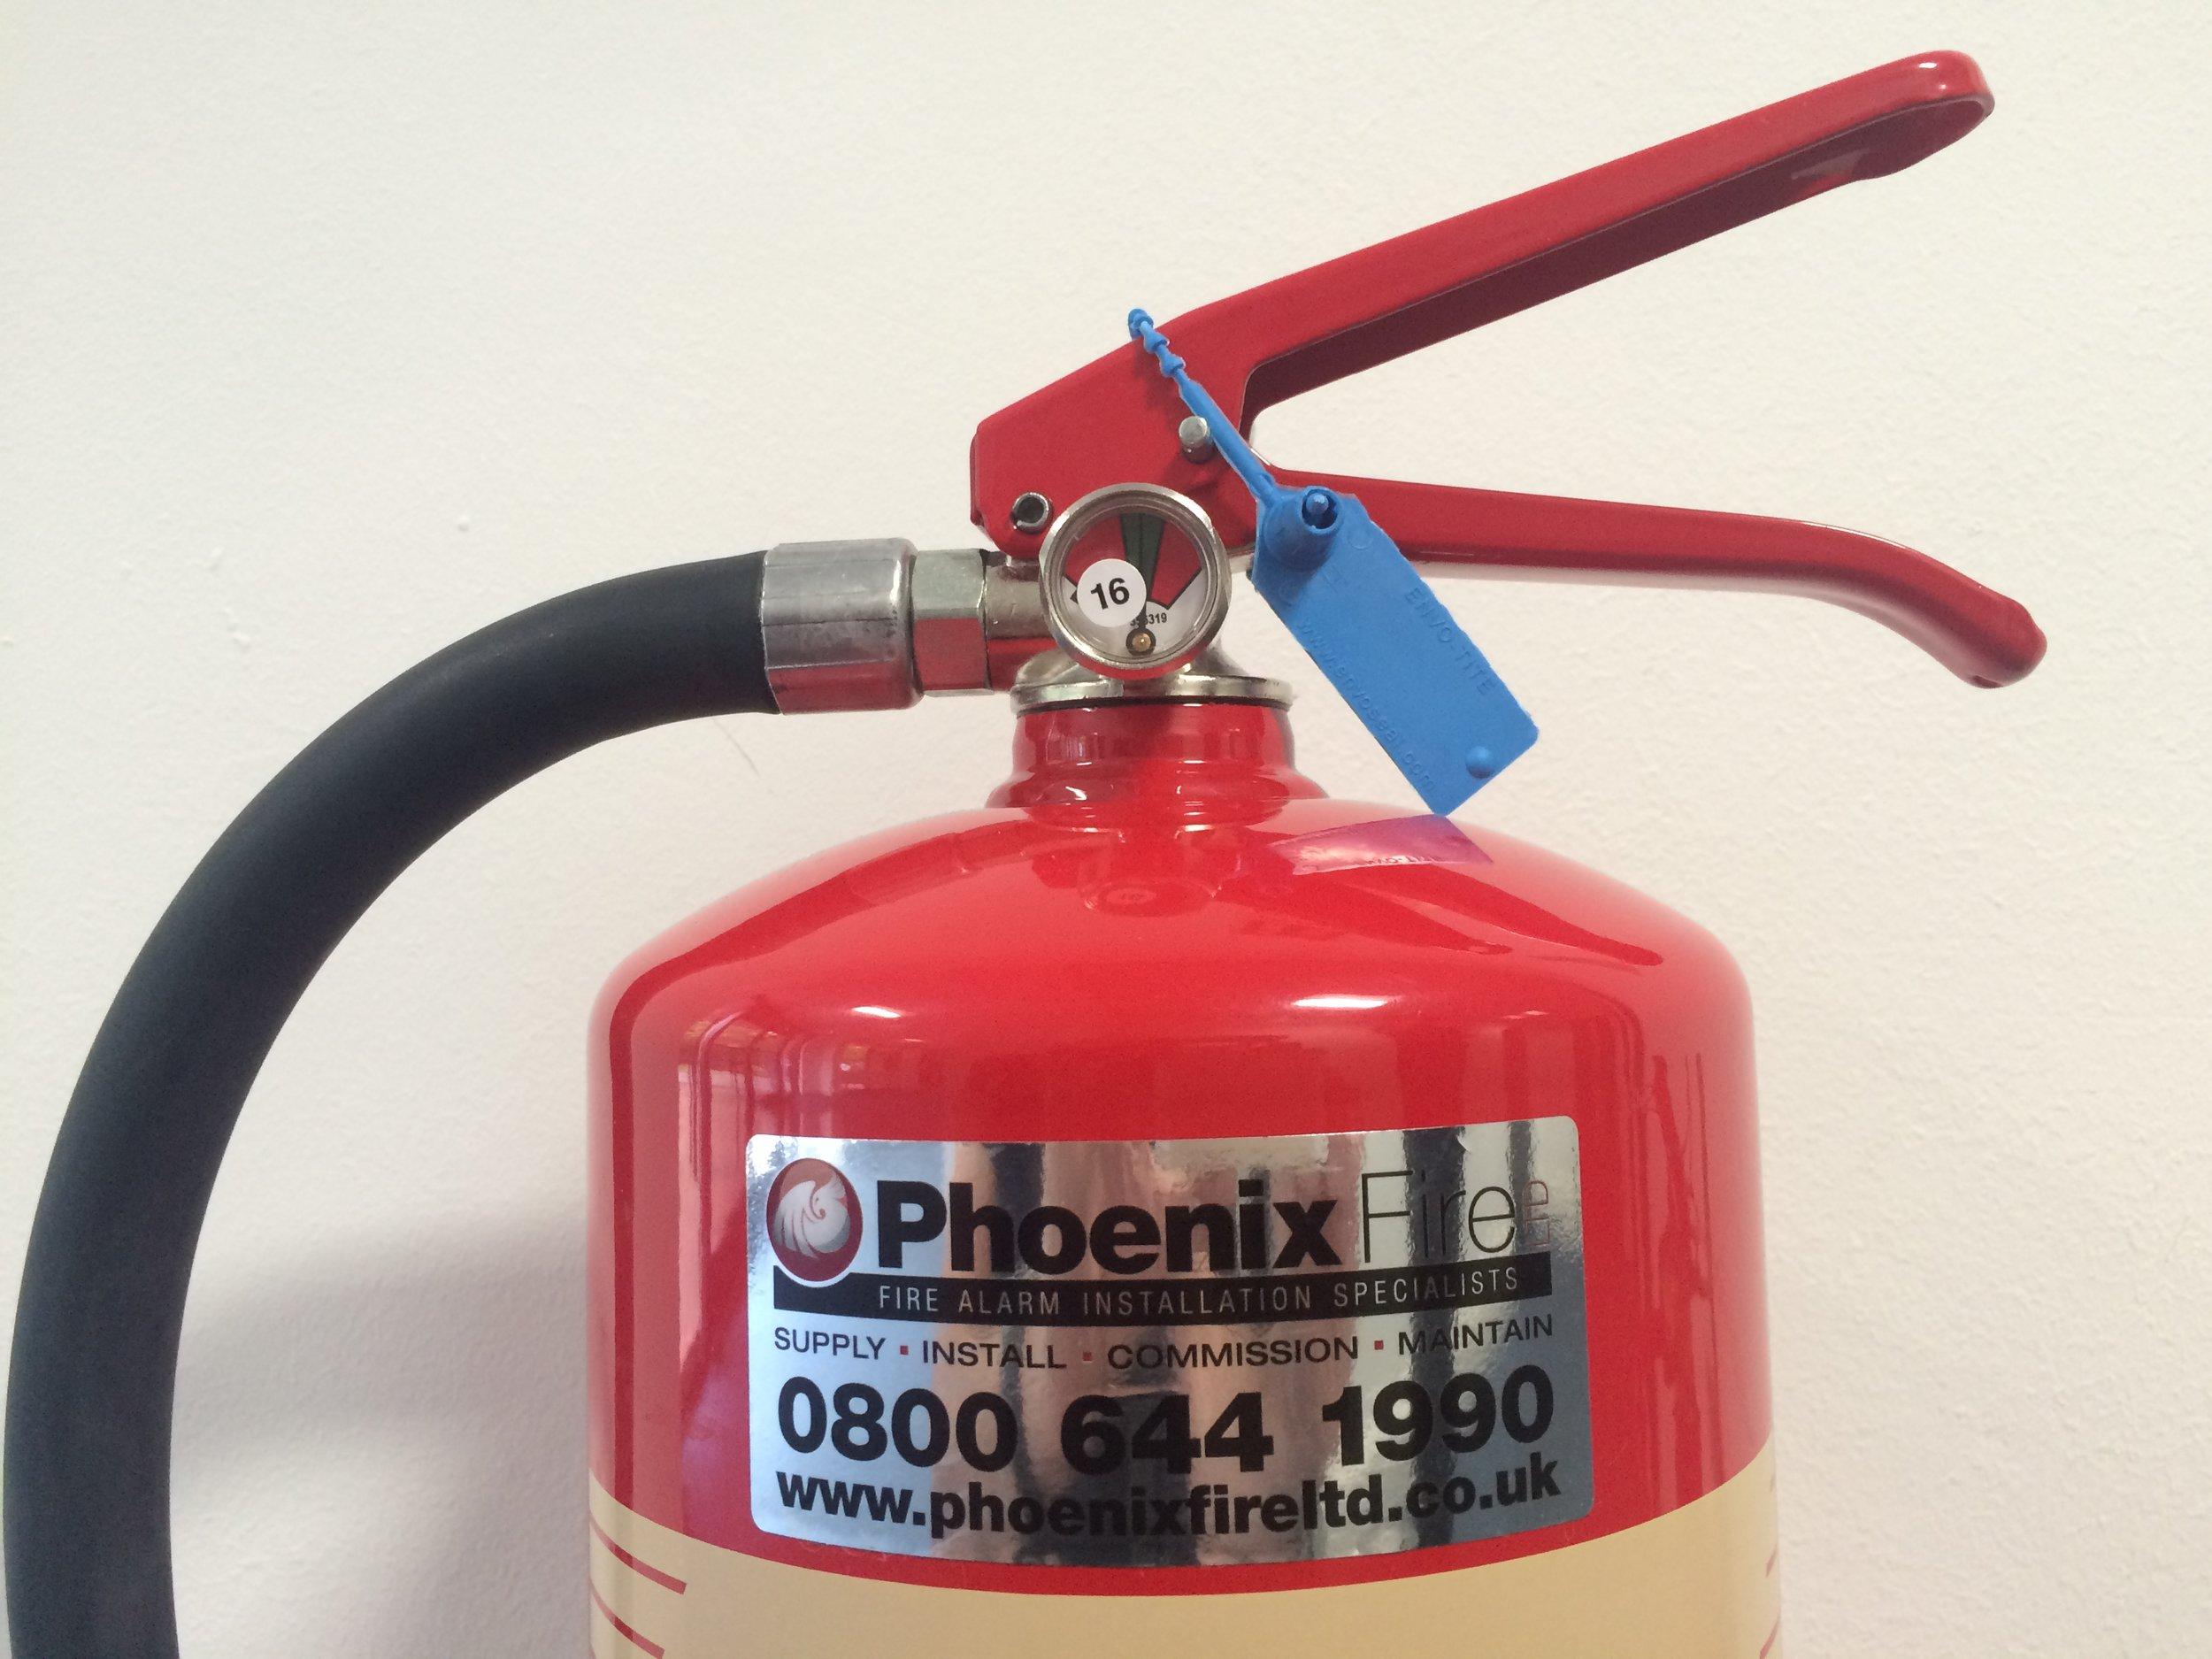 Phoenix Fire branded extinguisher